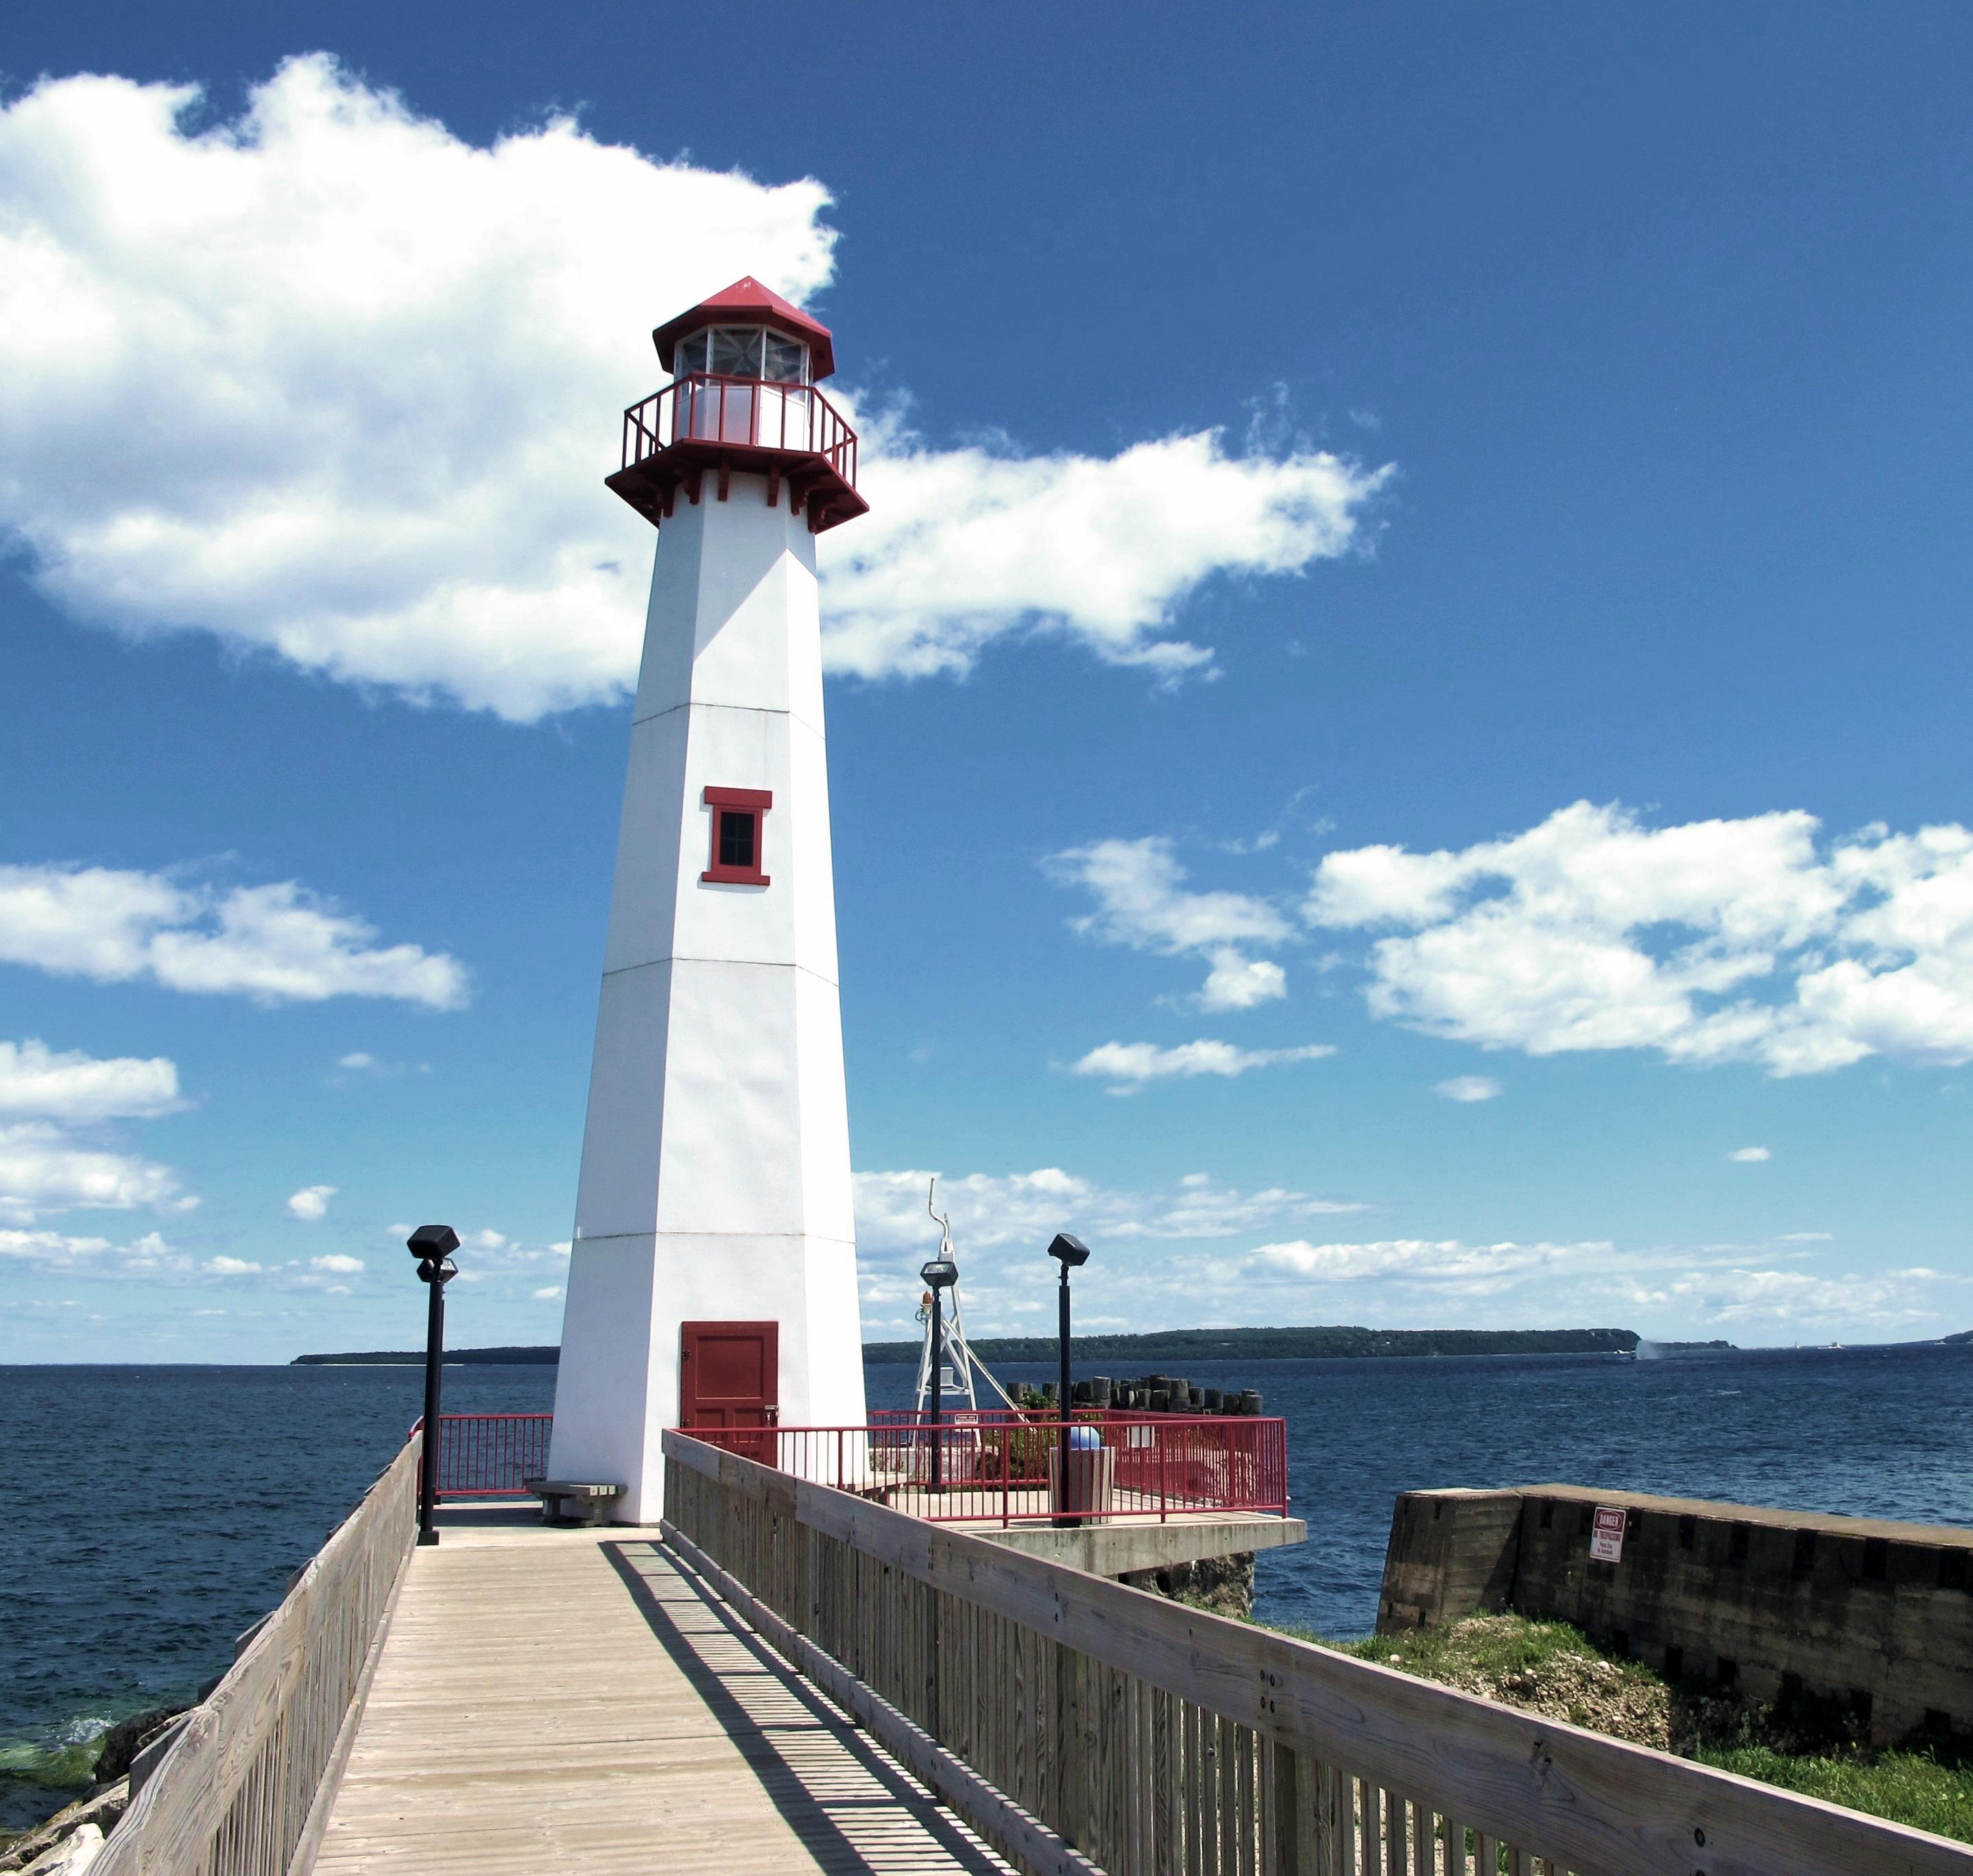 Awesome File:Wawatan Lighthouse 2010